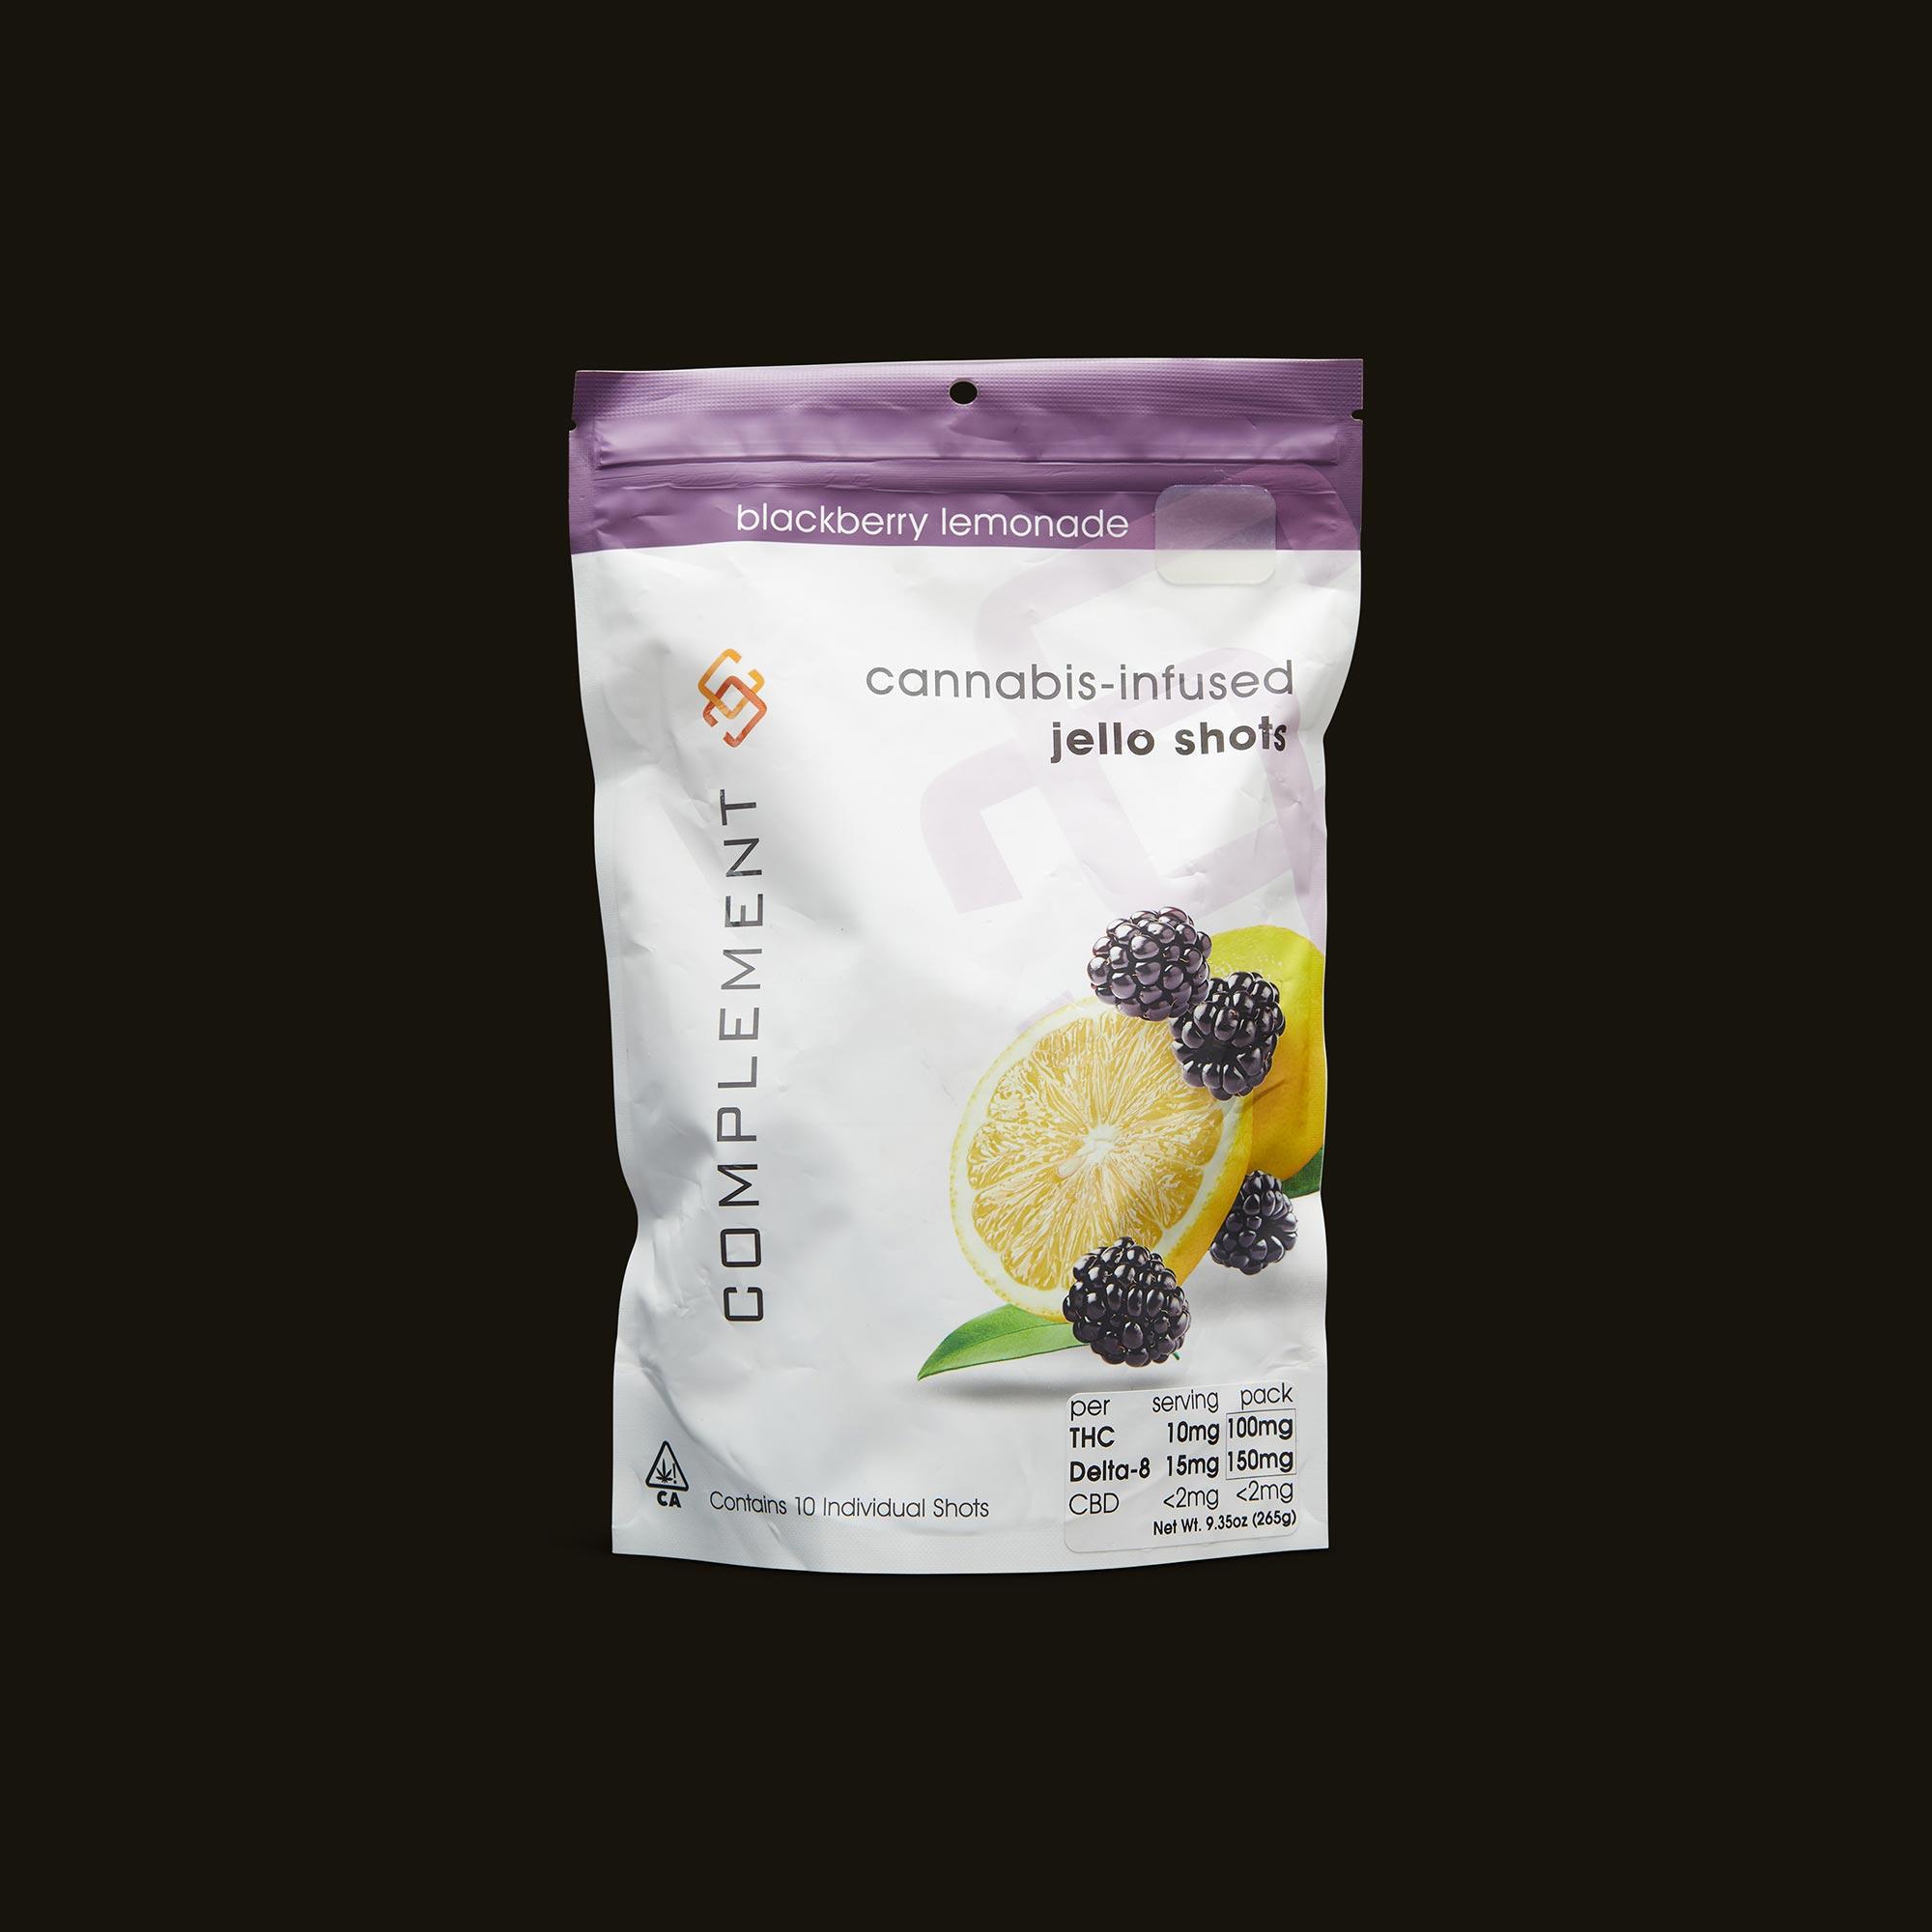 Blackberry Lemonade Jello Shots - 10 individual shots (100mg THC, 150mg Delta 8 THC, <2mg CBD)